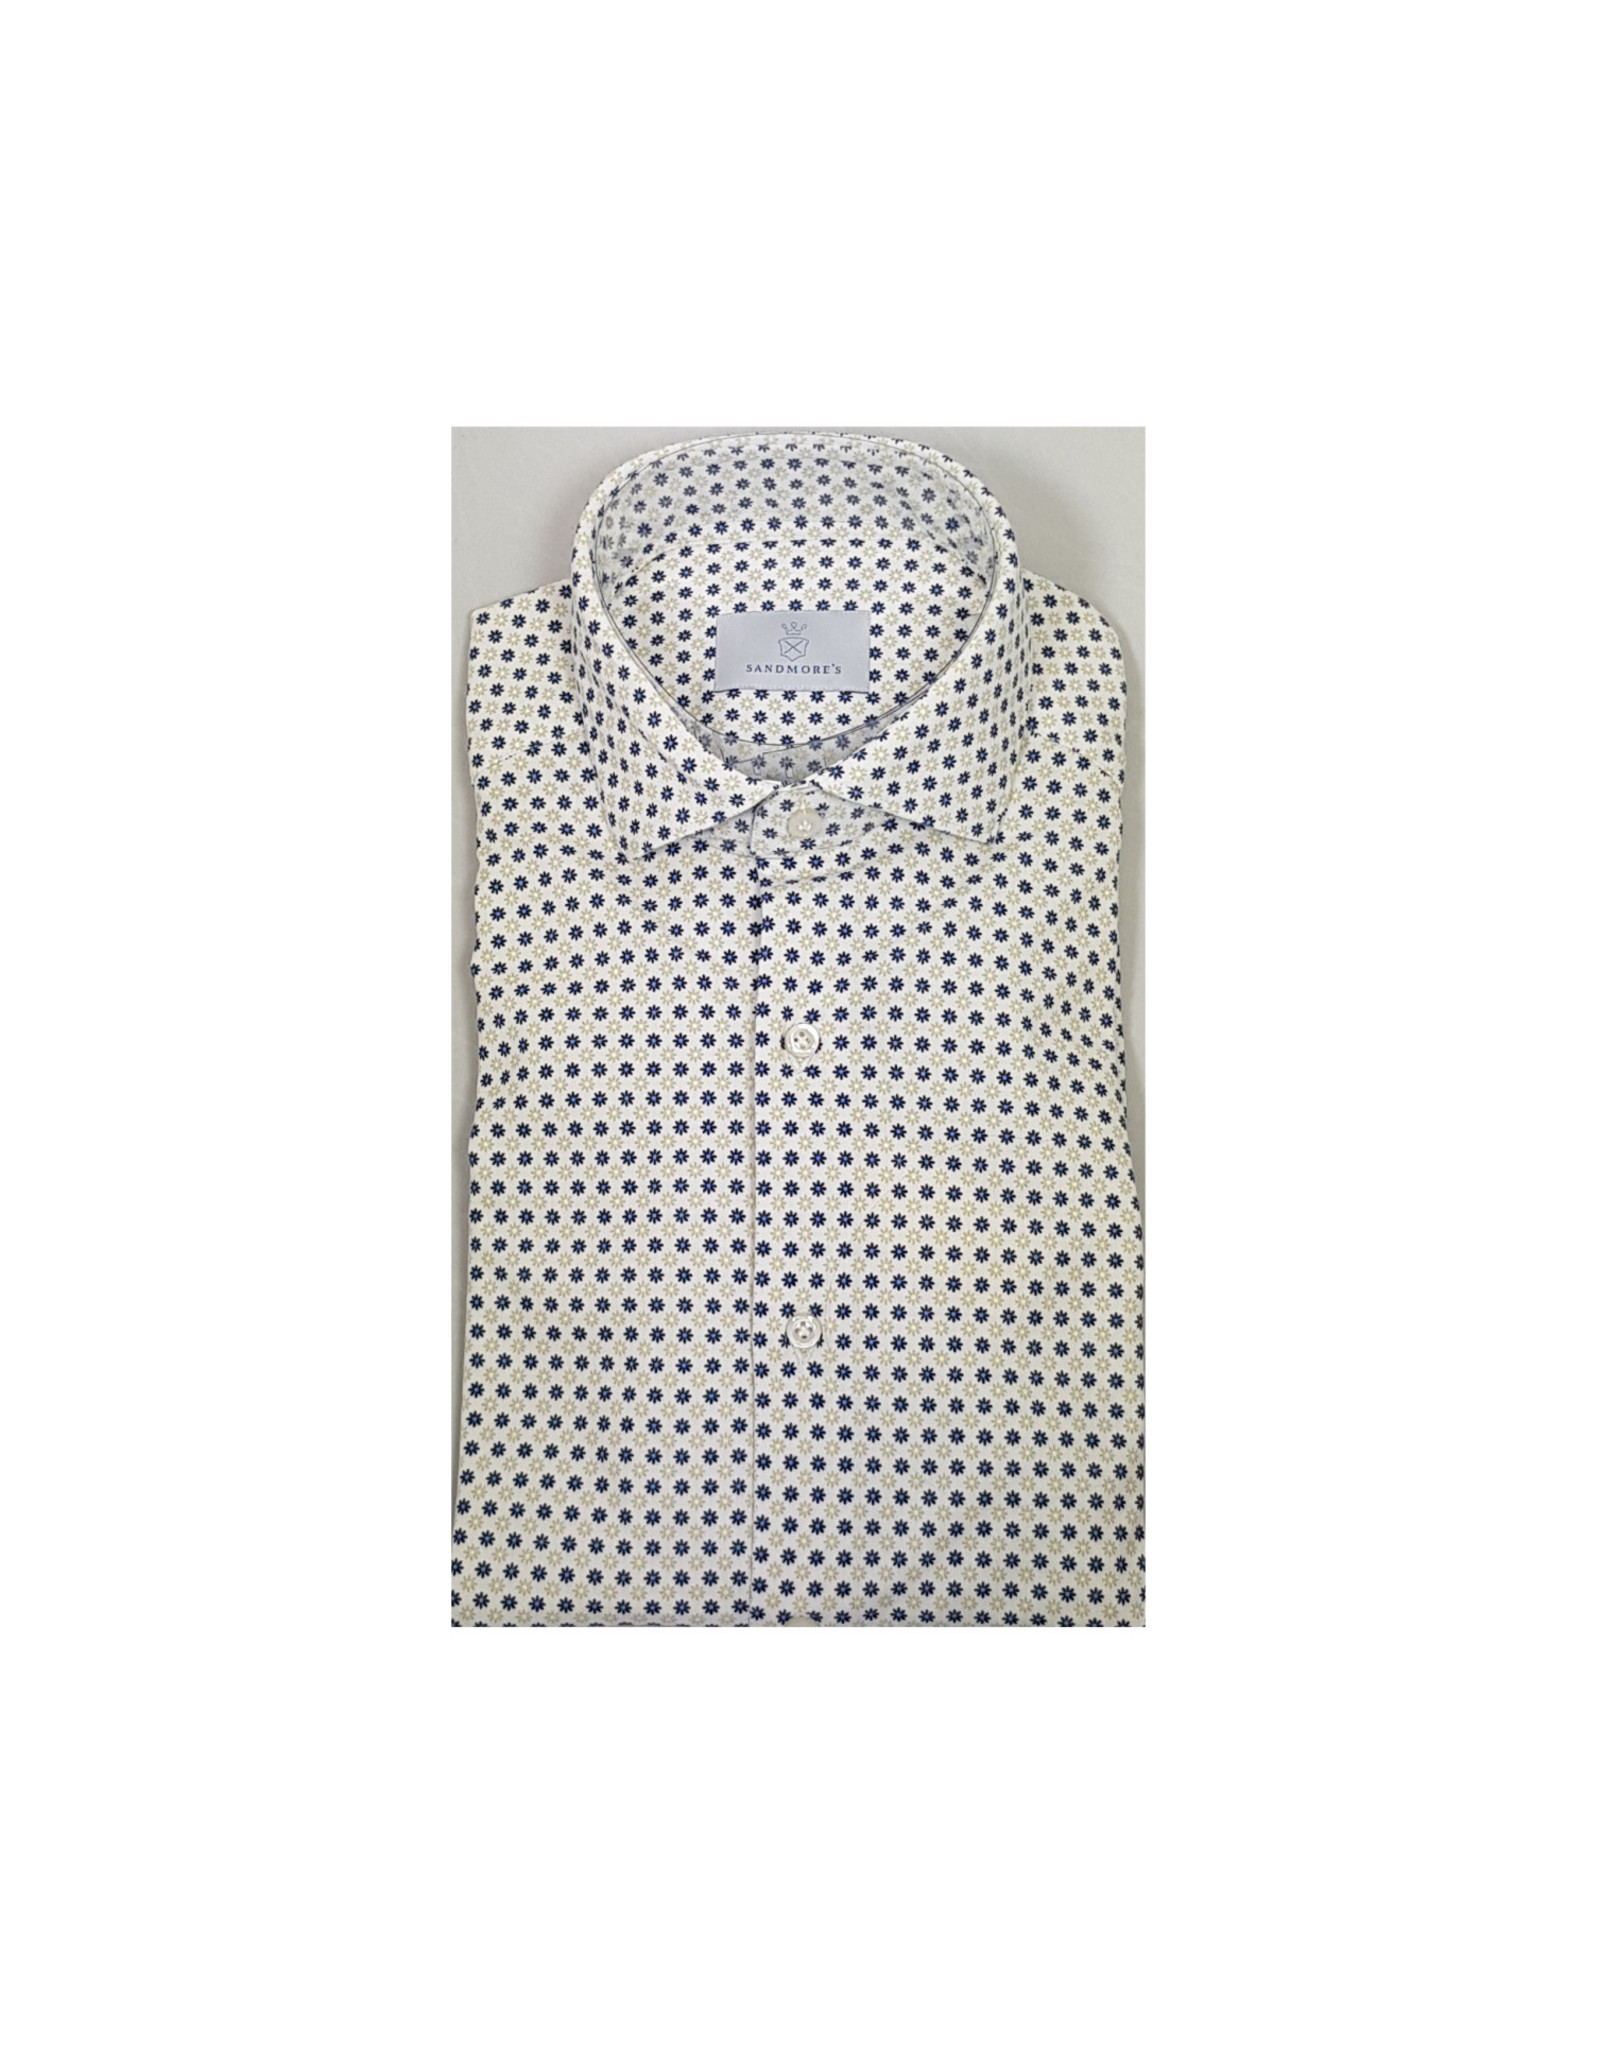 Ghirardelli Sandmore's hemd wit bloemetjesmotief slim J758/01